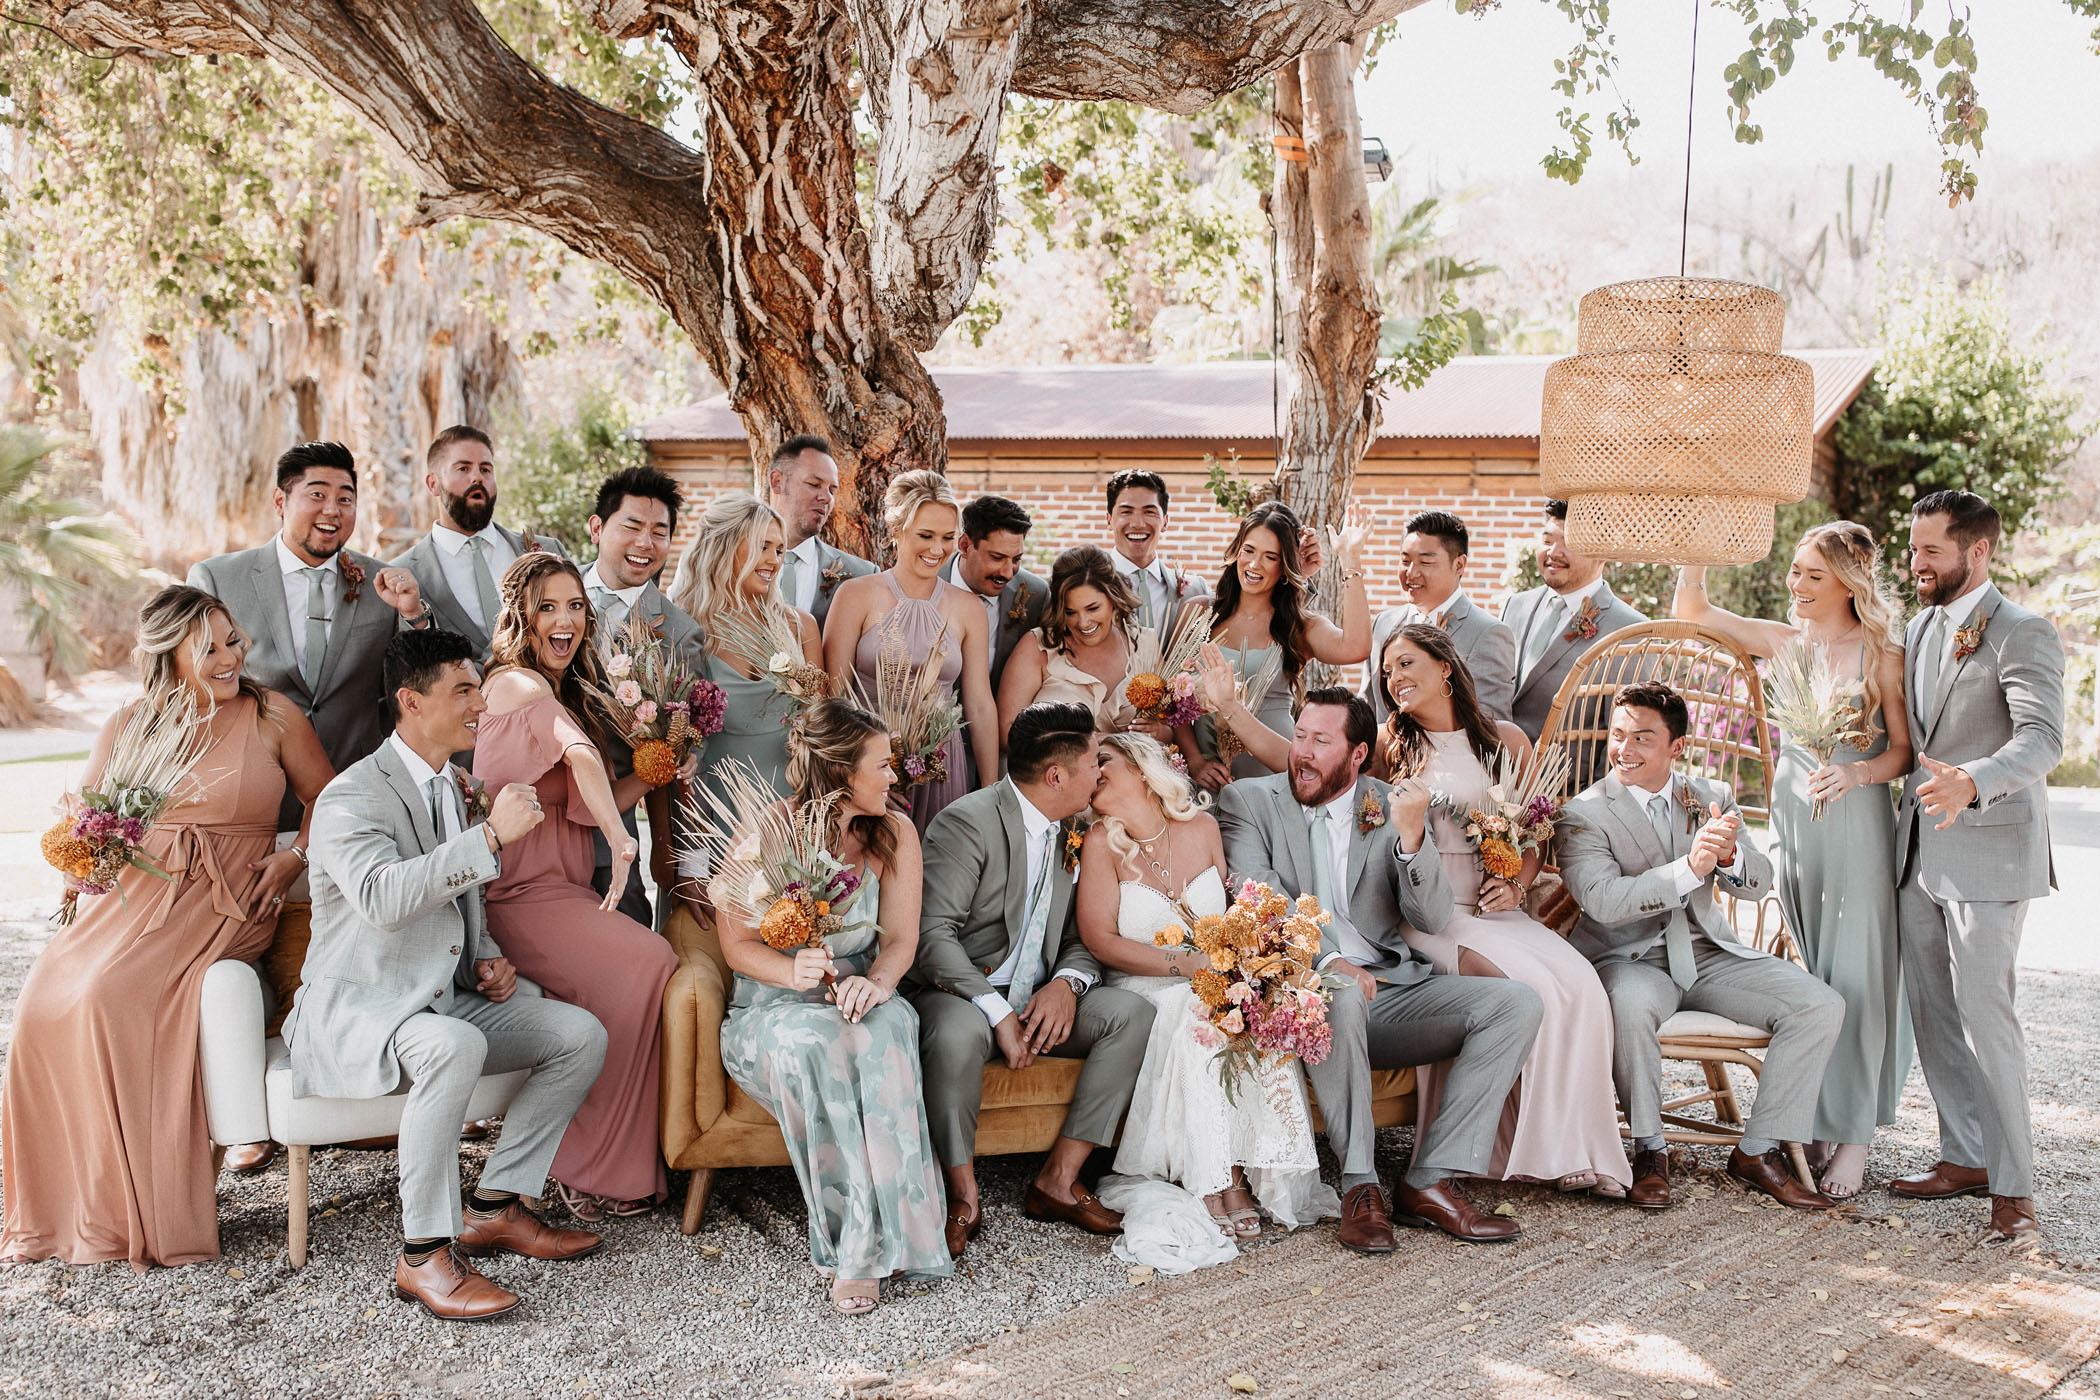 Wedding day photoshoot of the groomsmen and bridesmaids